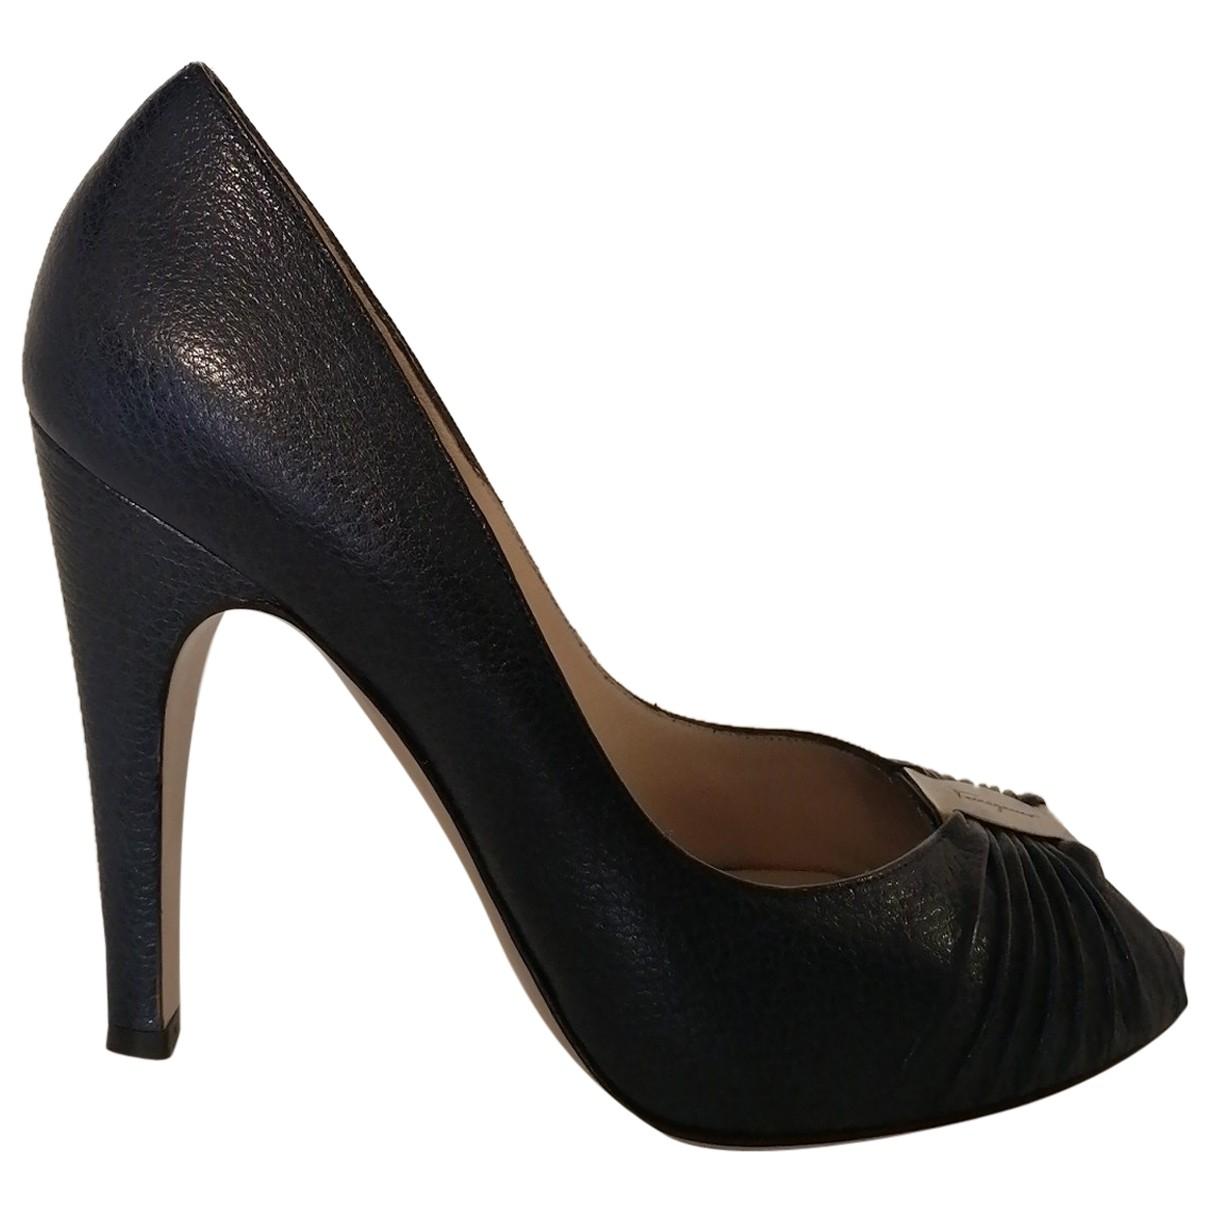 Salvatore Ferragamo \N Navy Leather Heels for Women 37.5 EU